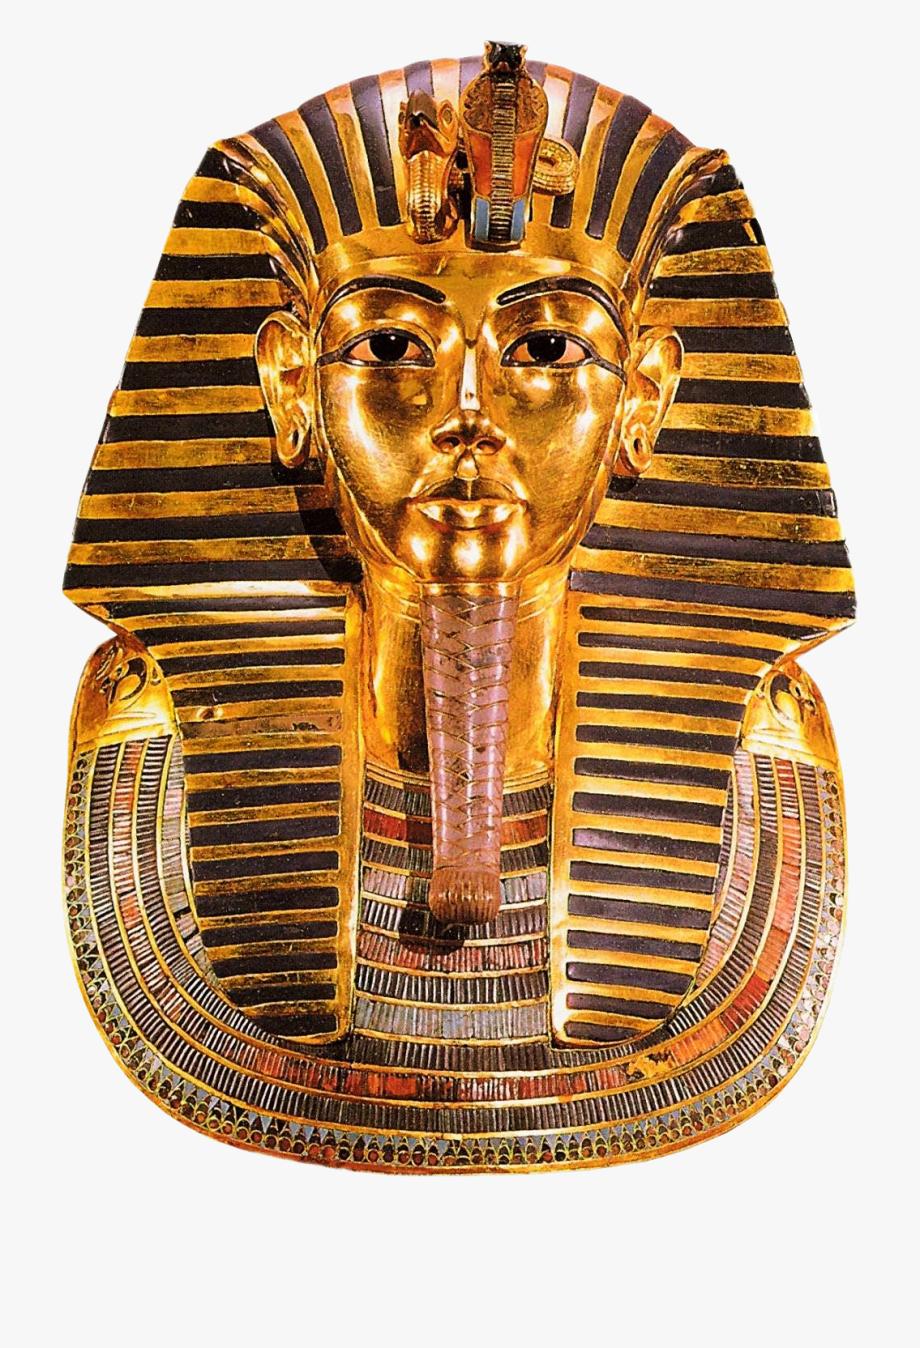 Mummy clipart egyptian mask. King tut transparent background